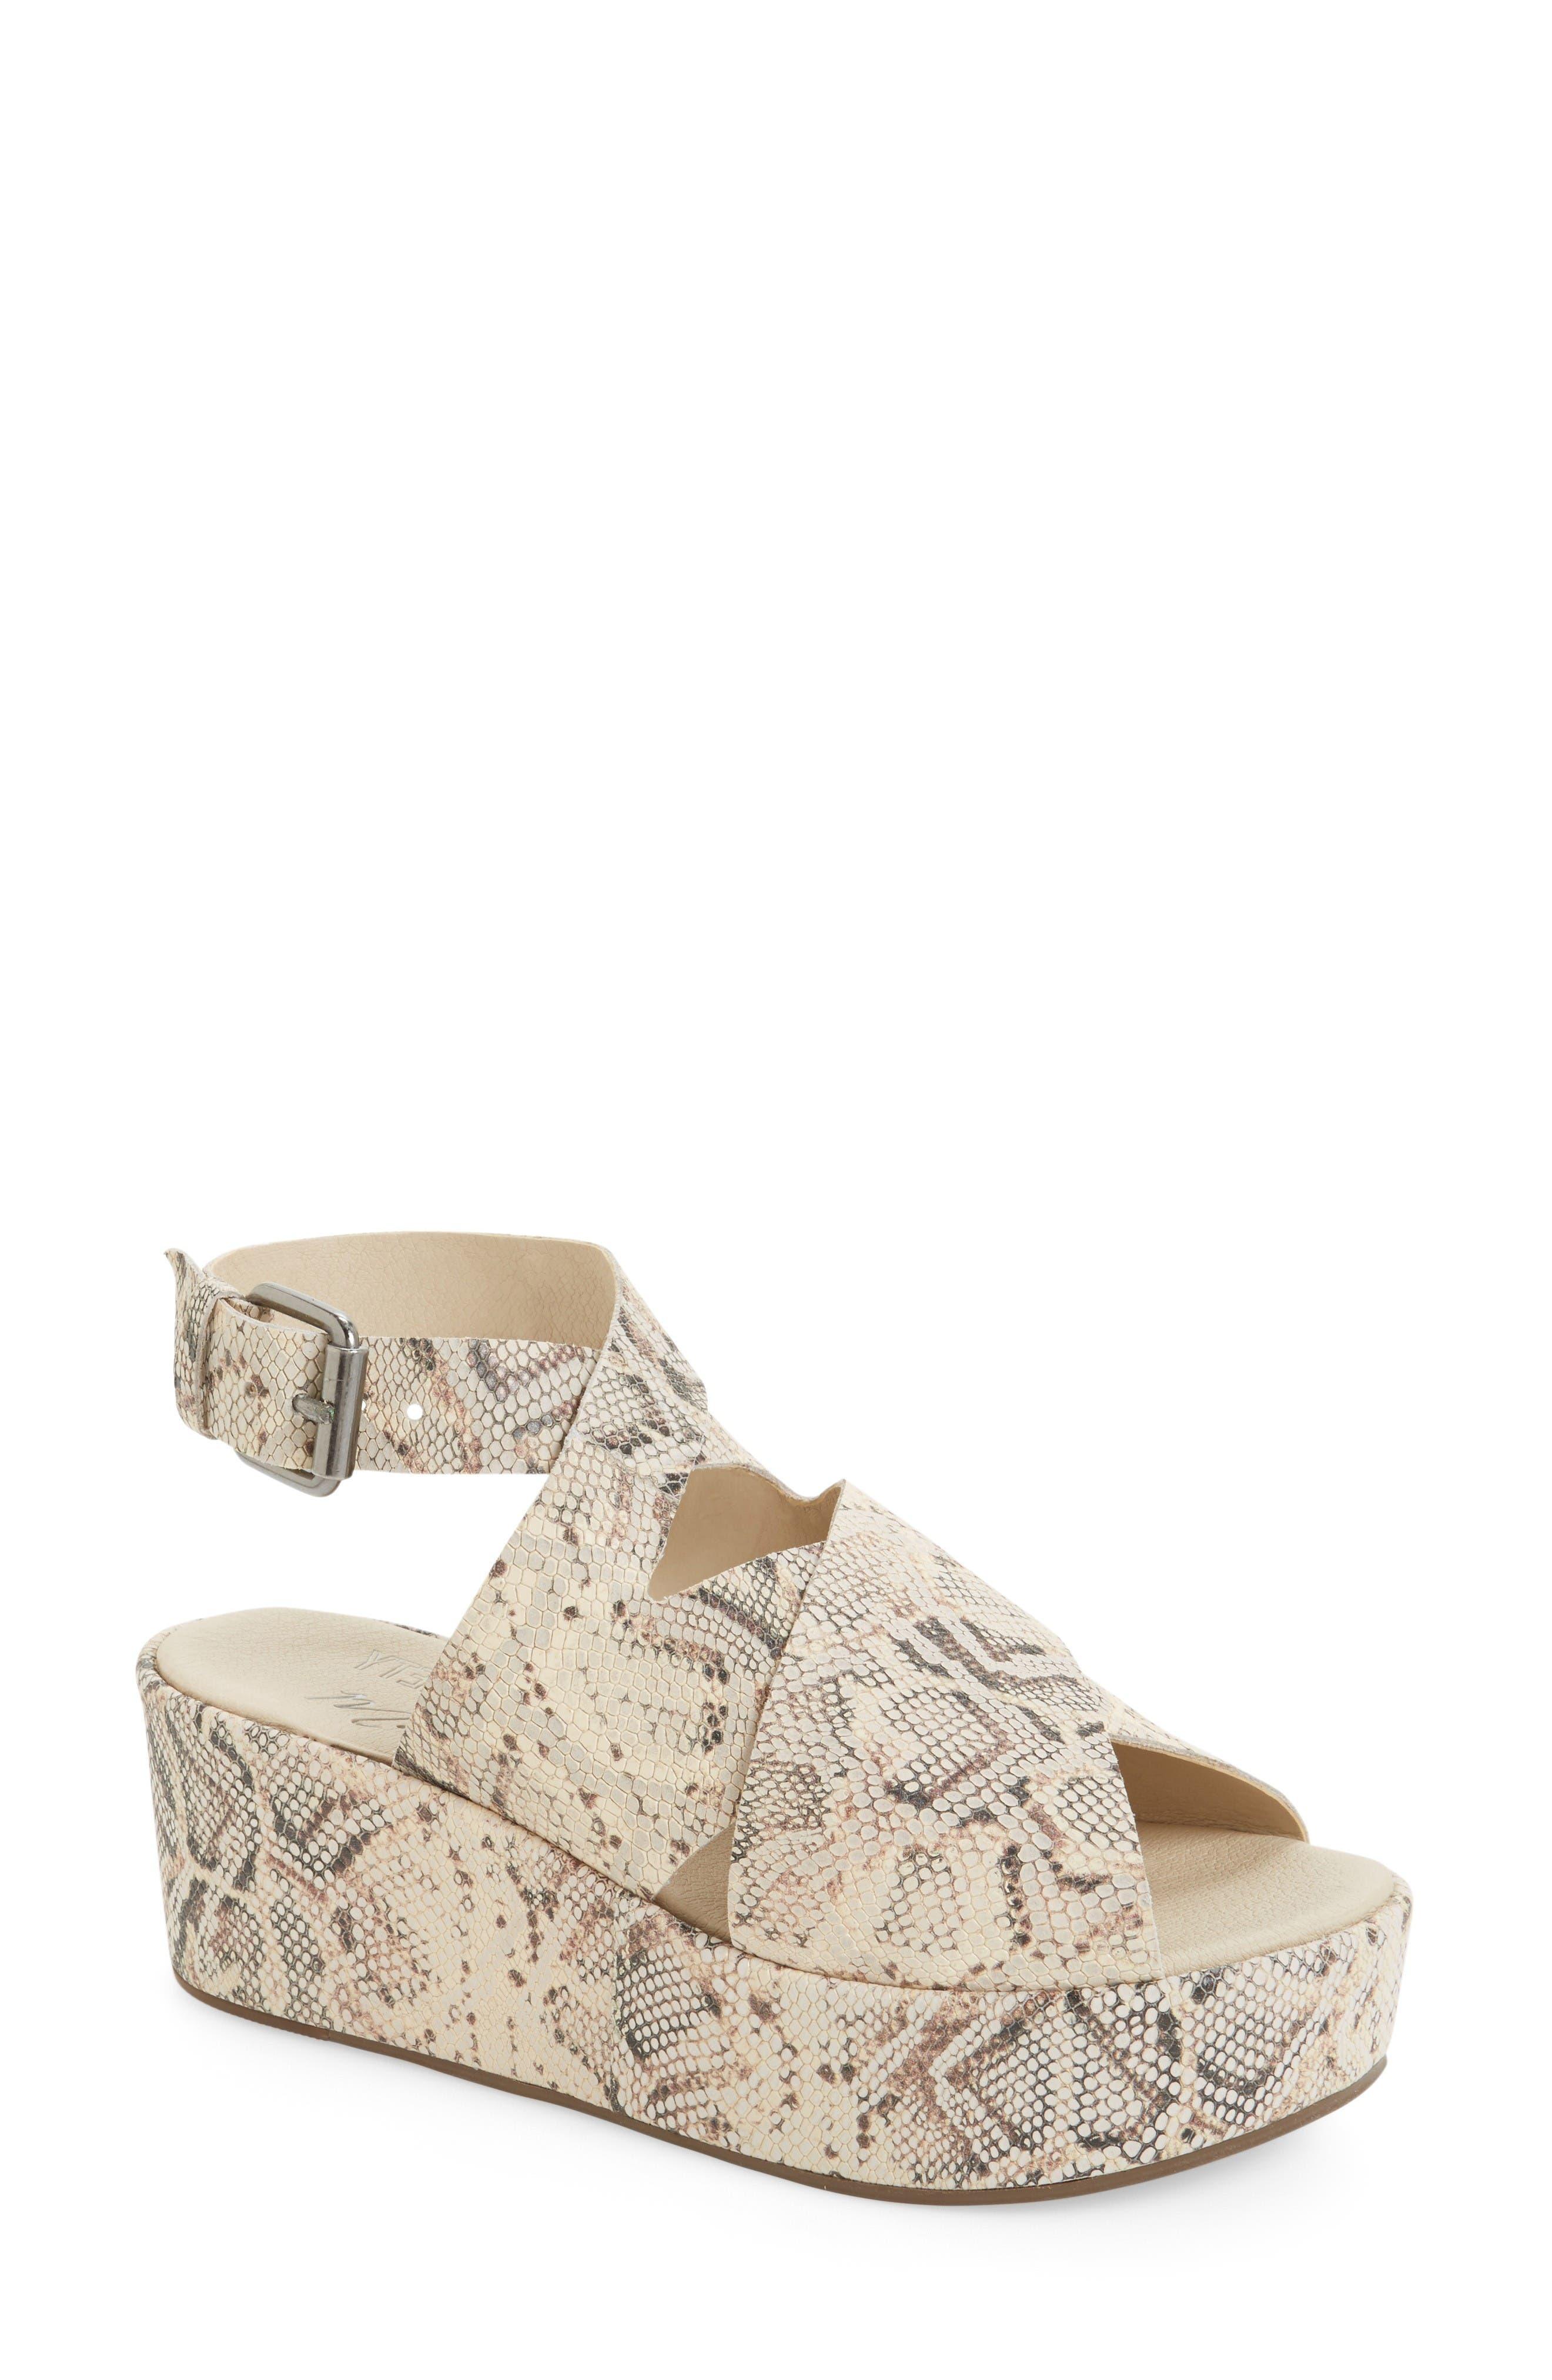 Amuse Society x Matisse Runway Wedge Sandal (Women)